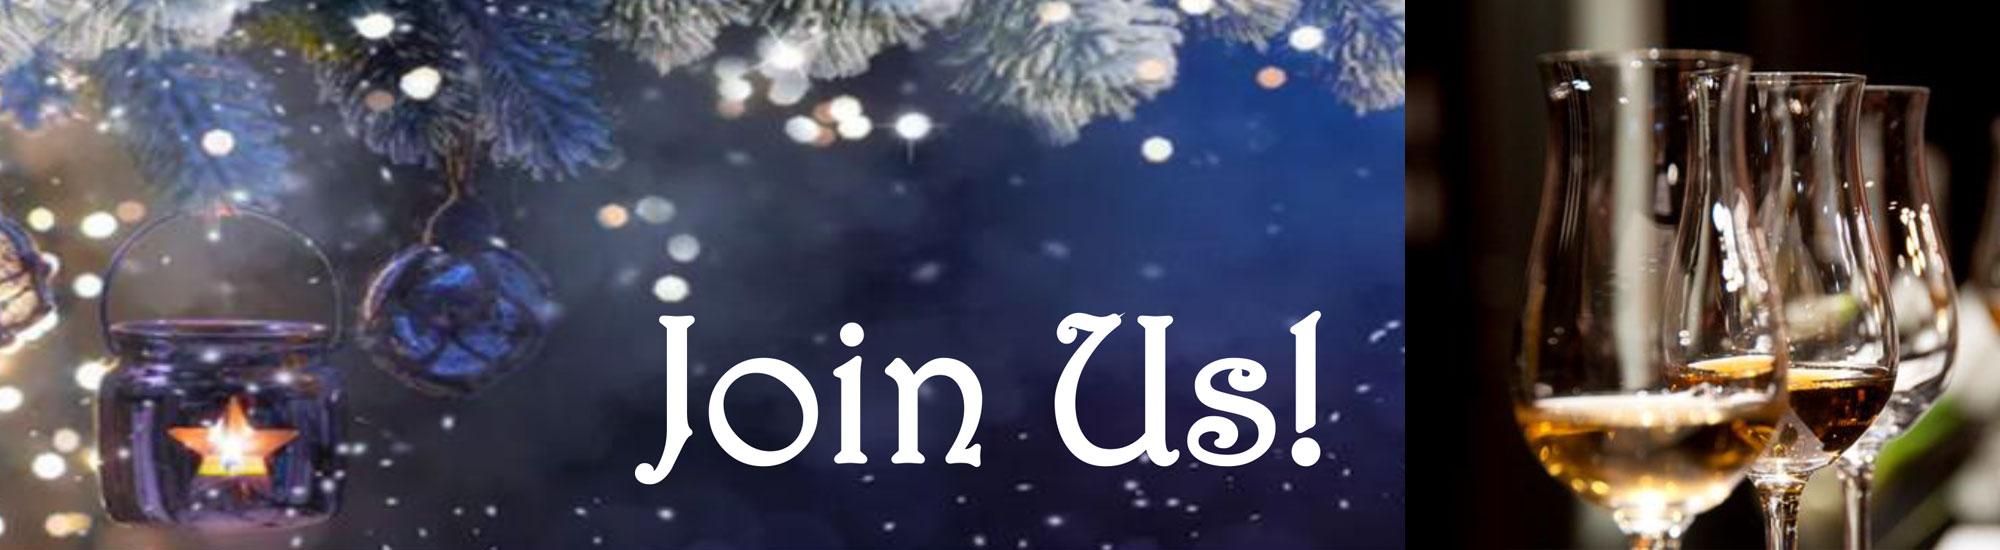 Join Us! FSF Winter Wonderland Annual Fundraiser, Reston VA